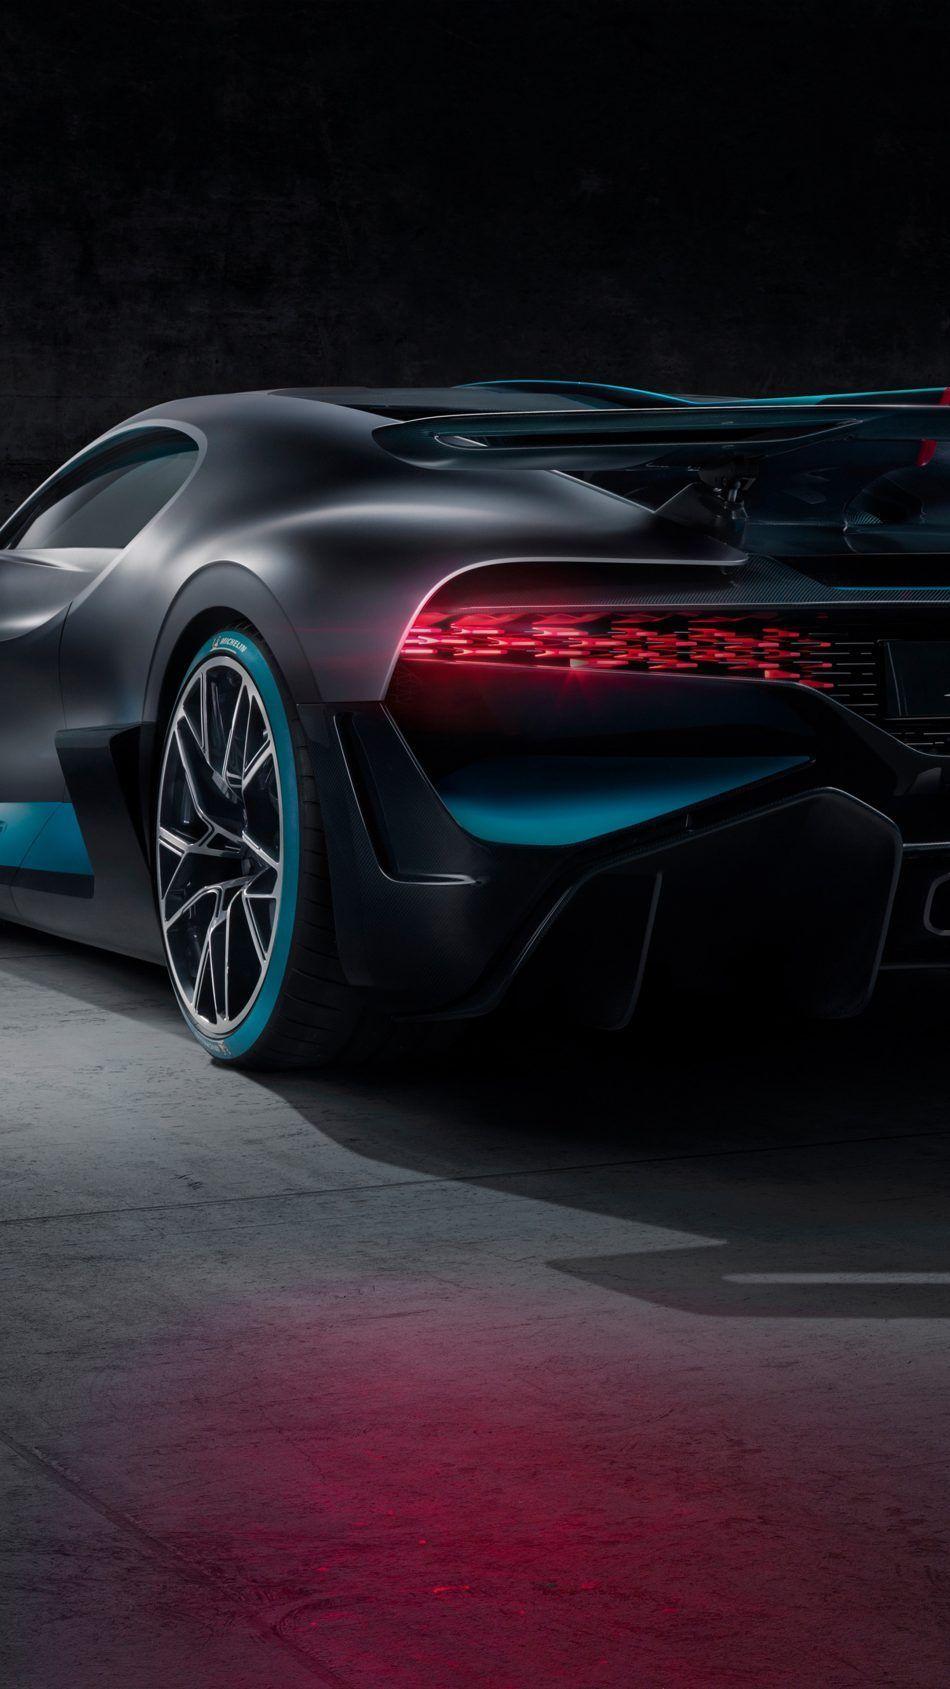 Bugatti Divo 2019 Car Wallpapers Car Wallpaper For Mobile Sports Car Wallpaper